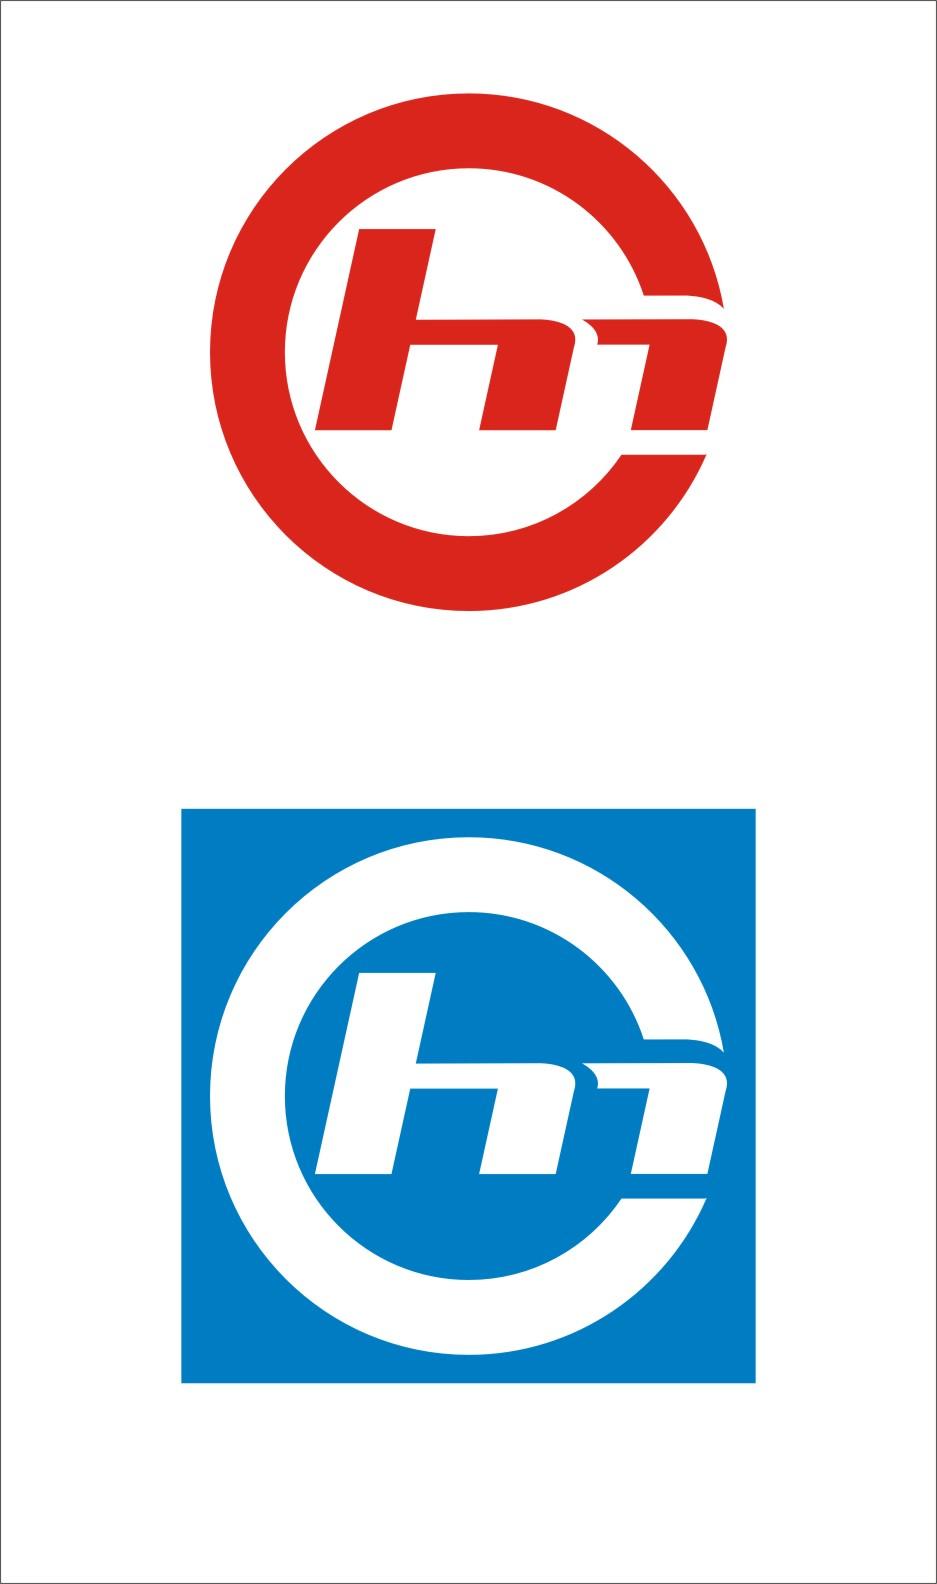 hm公司logo设计- 稿件[#2562958]